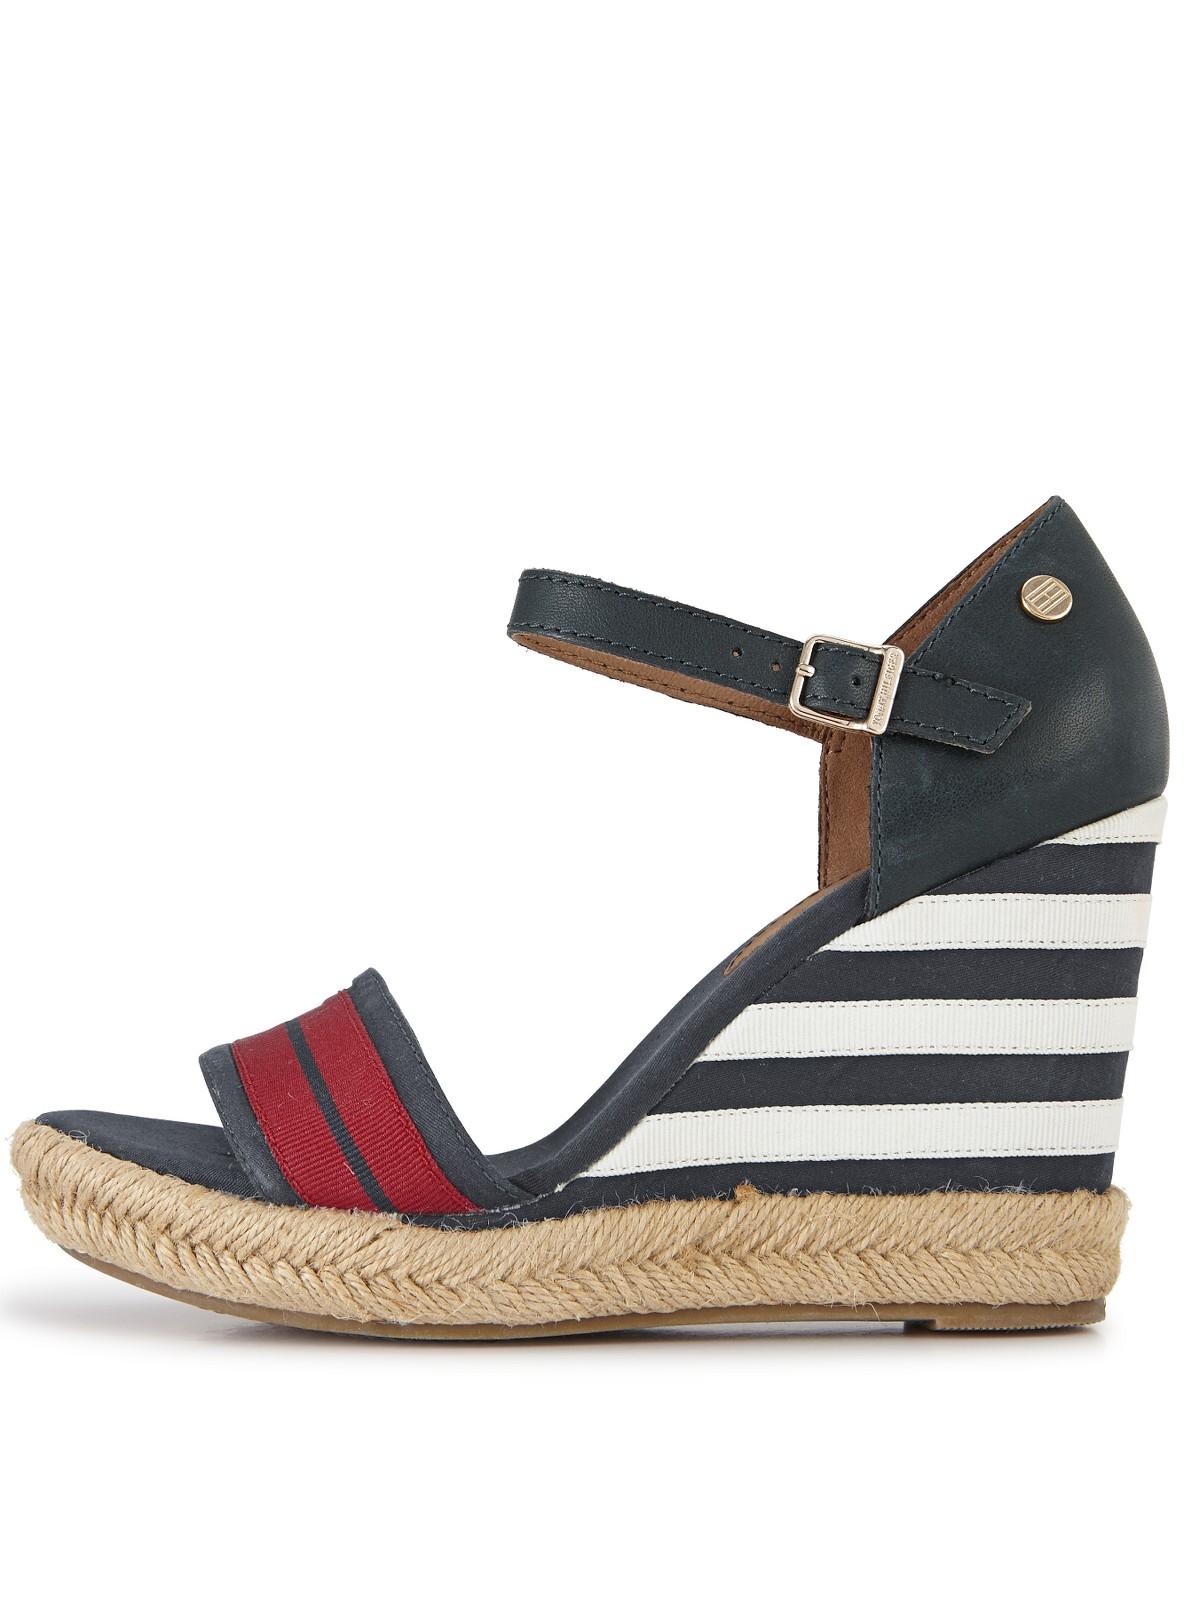 tommy hilfiger emery stripe wedge sandals in blue red white blue lyst. Black Bedroom Furniture Sets. Home Design Ideas